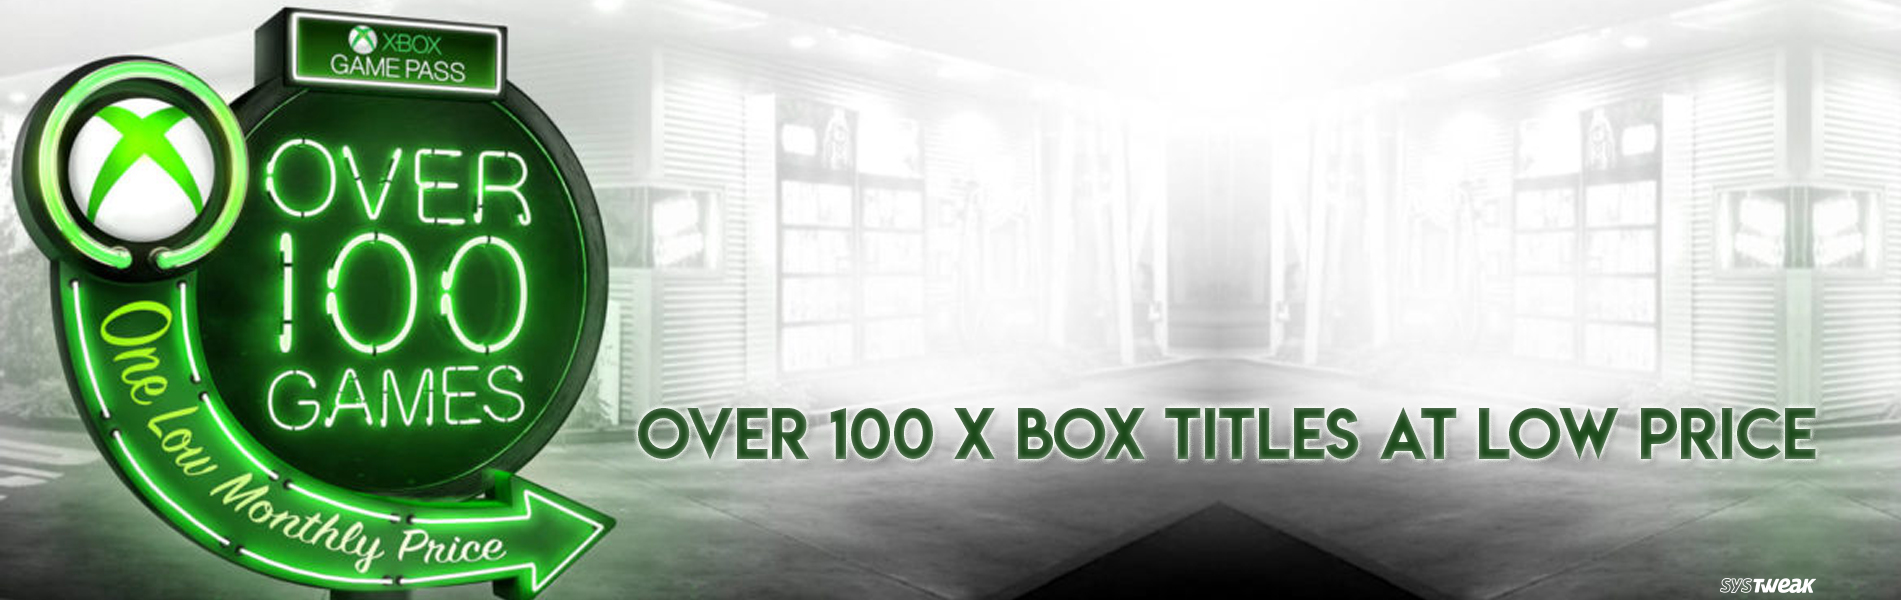 Xbox Game Pass: Every Gamer's Desire!